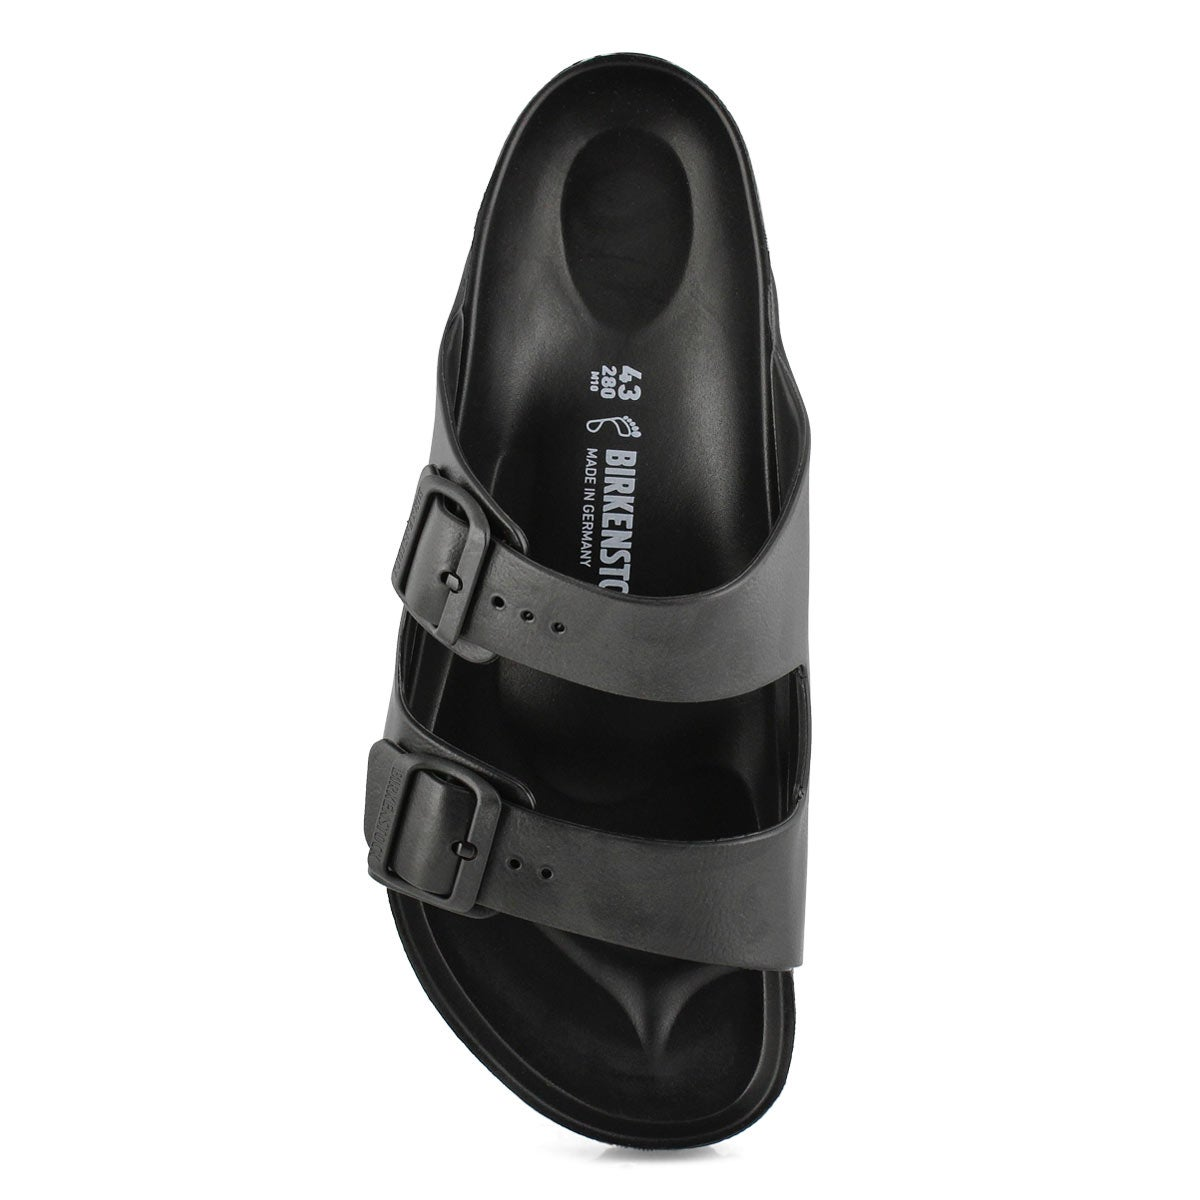 Mns Arizona black EVA sandal - Medium